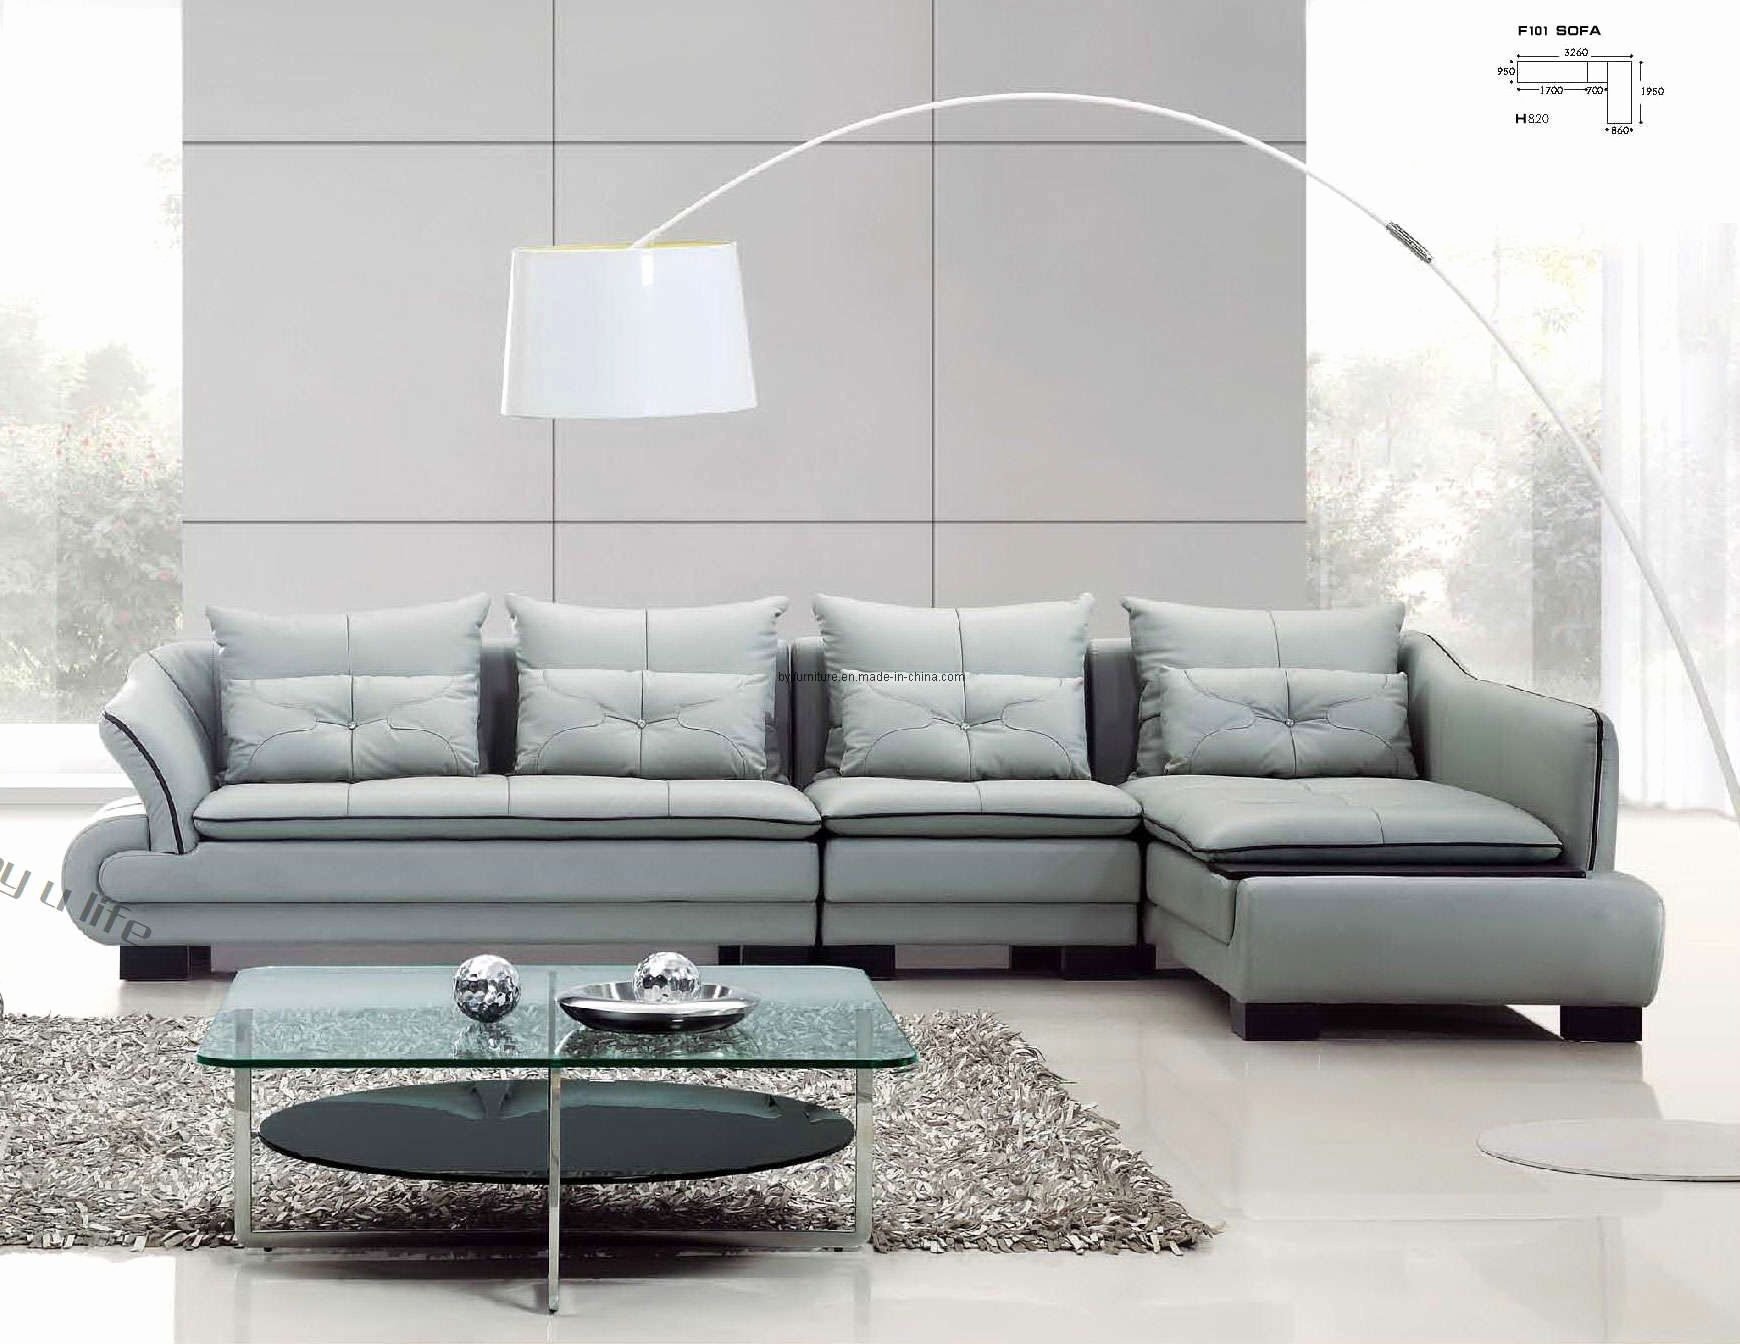 Luxury Sofa Designs For Living Room Image Sofa Designs For Living Room Luxury 25 Latest Sofa Set De Latest Sofa Designs Couch Design Grey Furniture Living Room